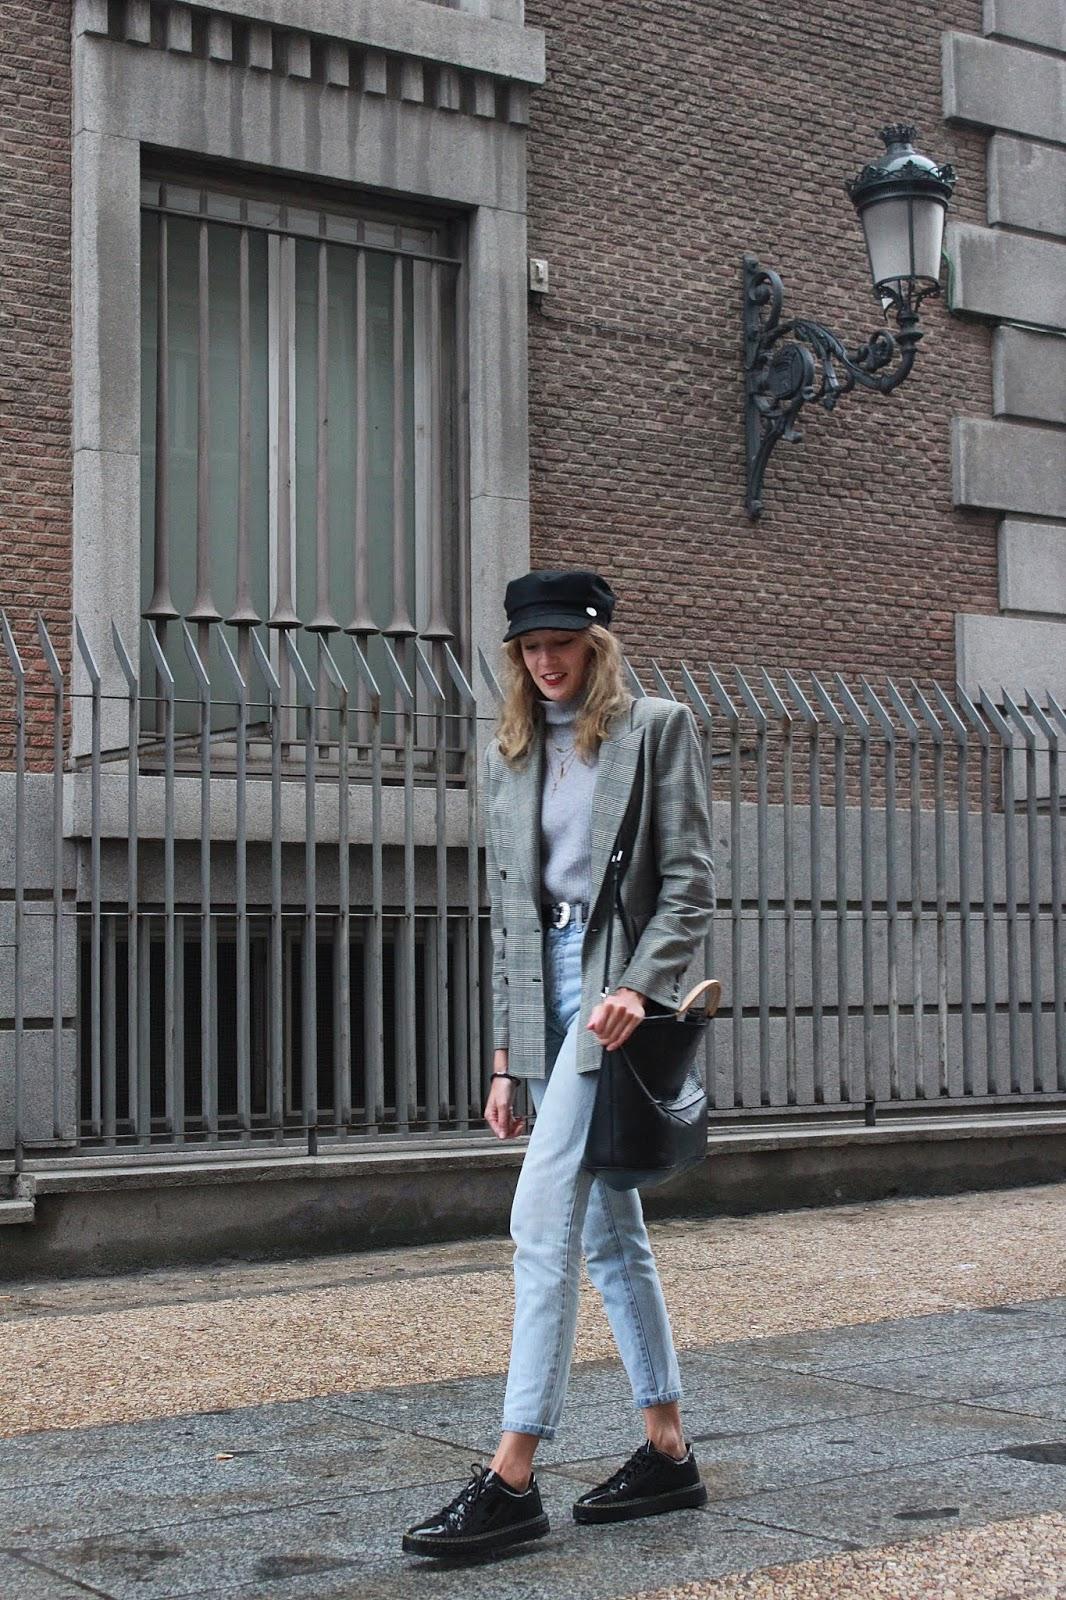 dfranklin sneakers americana cuadros gorra marinera british street style